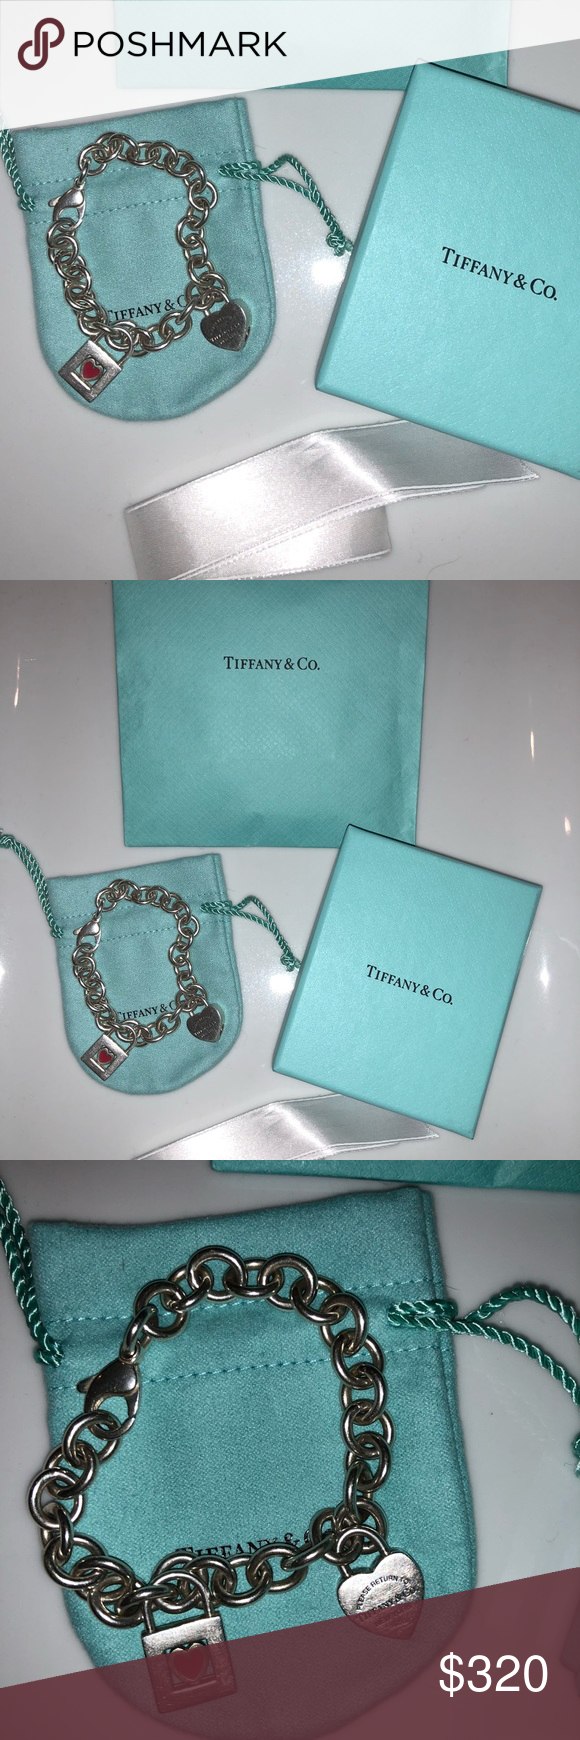 Sale tiffany u co charm bracelet tiffany box tiffany and